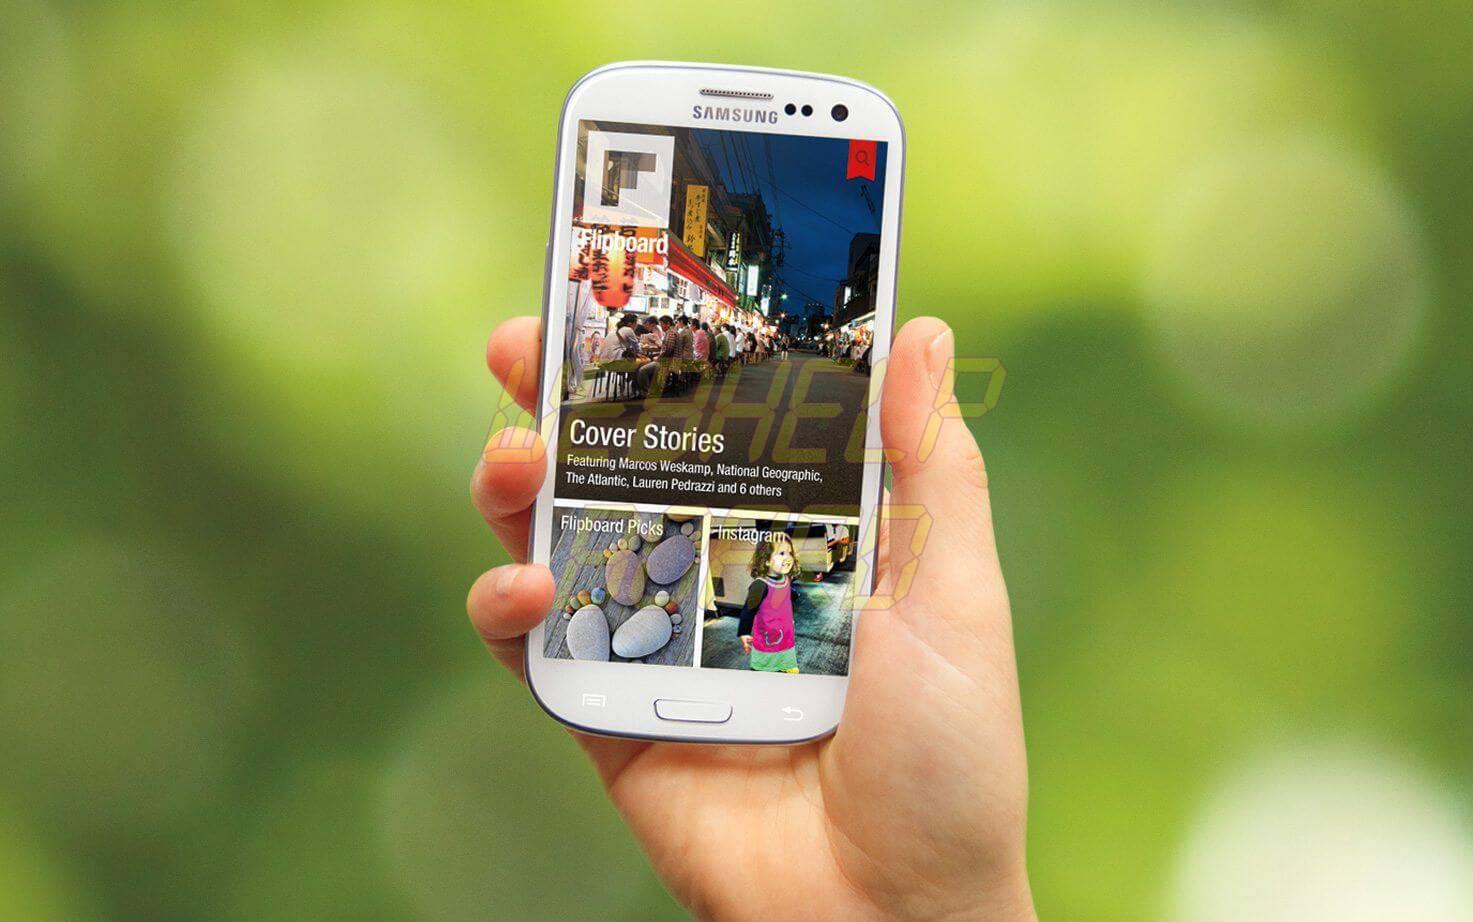 flipboard android - Tutorial: Como desativar a função TalkBack no Android